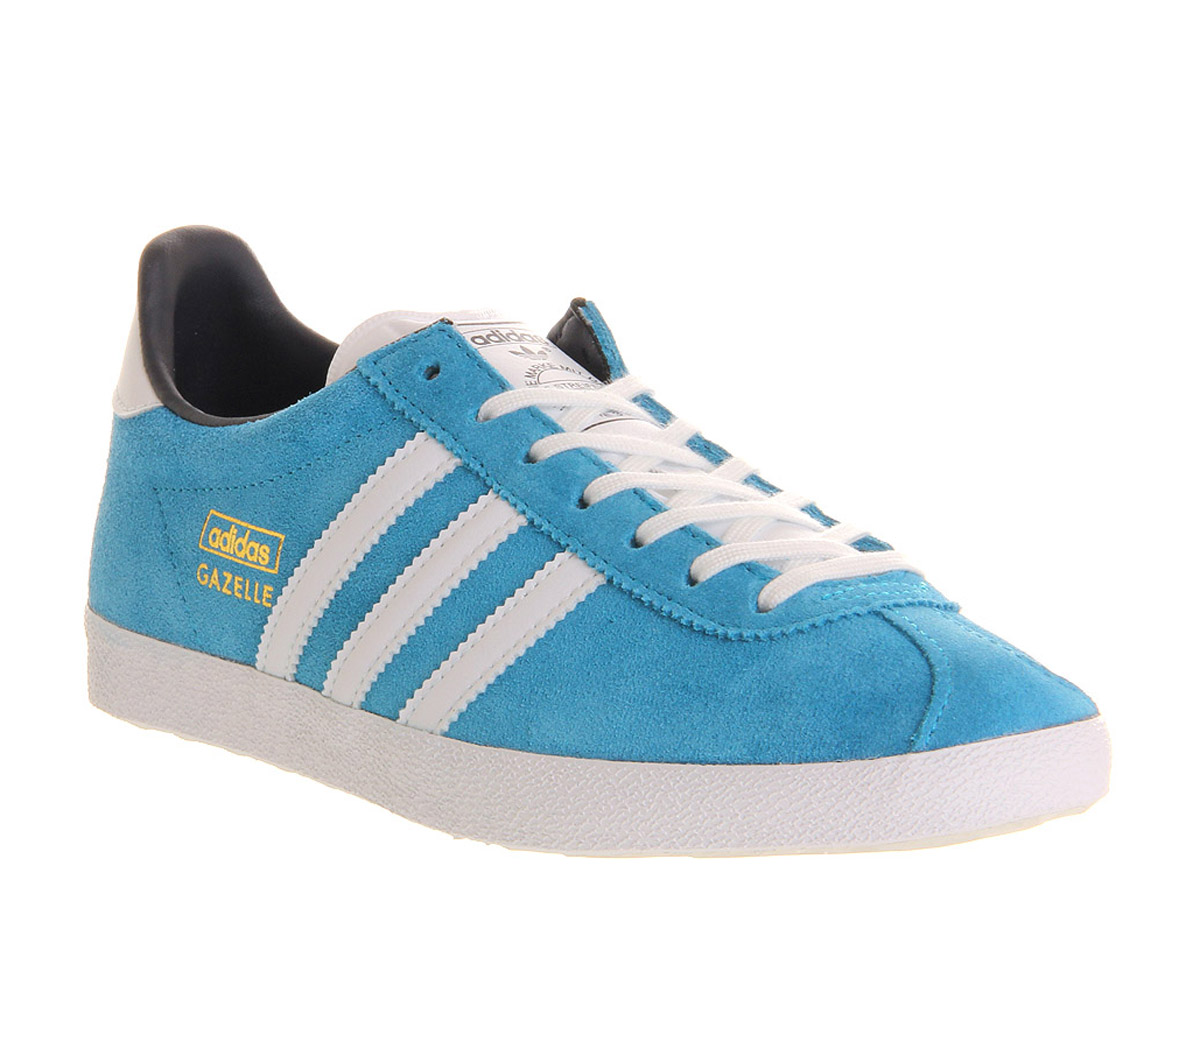 adidas Gazelle Og W in Turquoise (Blue) - Lyst